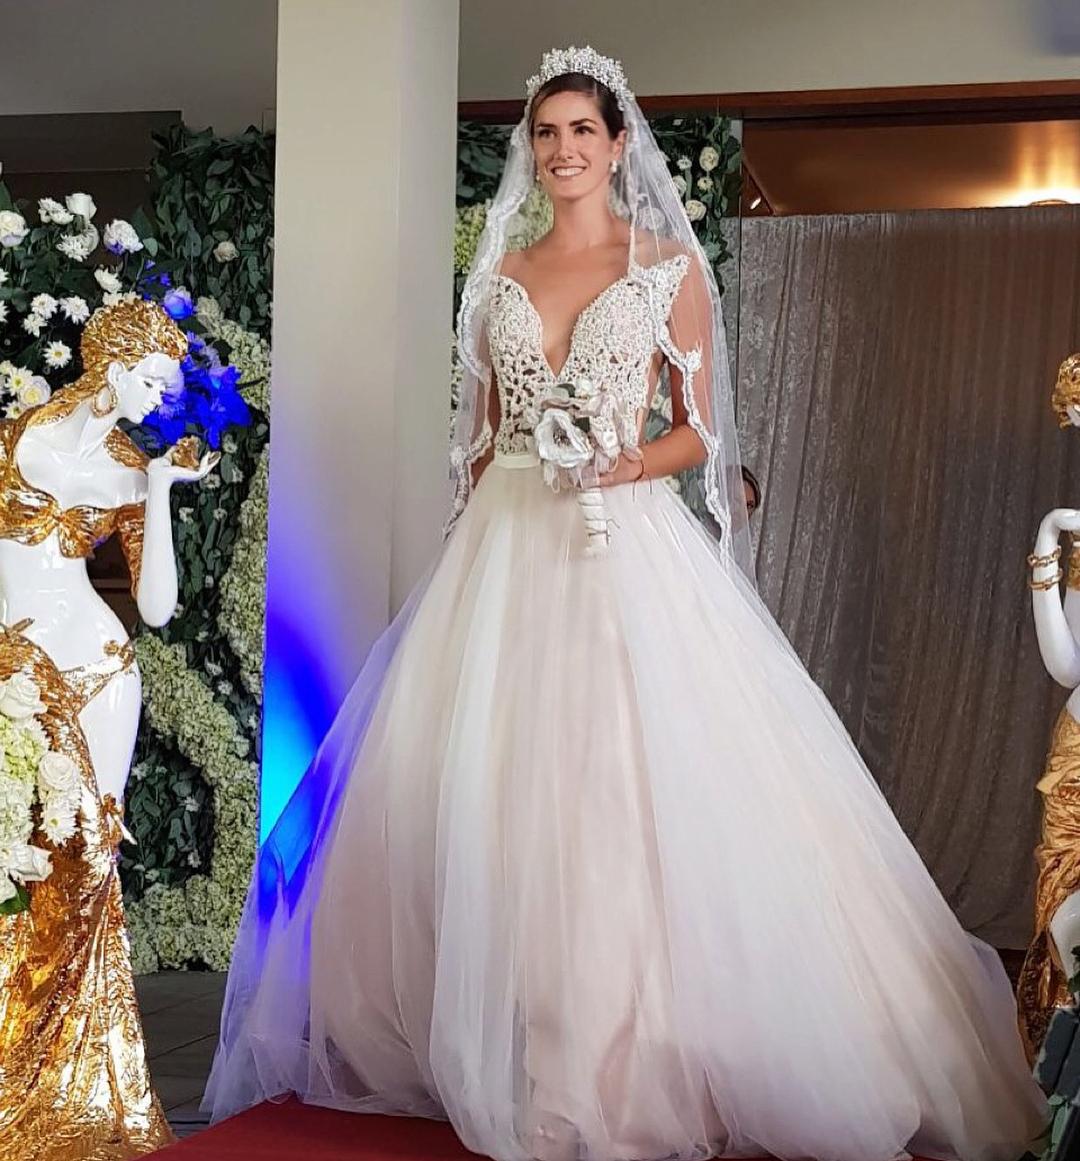 jessica mcfarlane, 7 finalista de reyna hispanoamericana 2018. 31720510